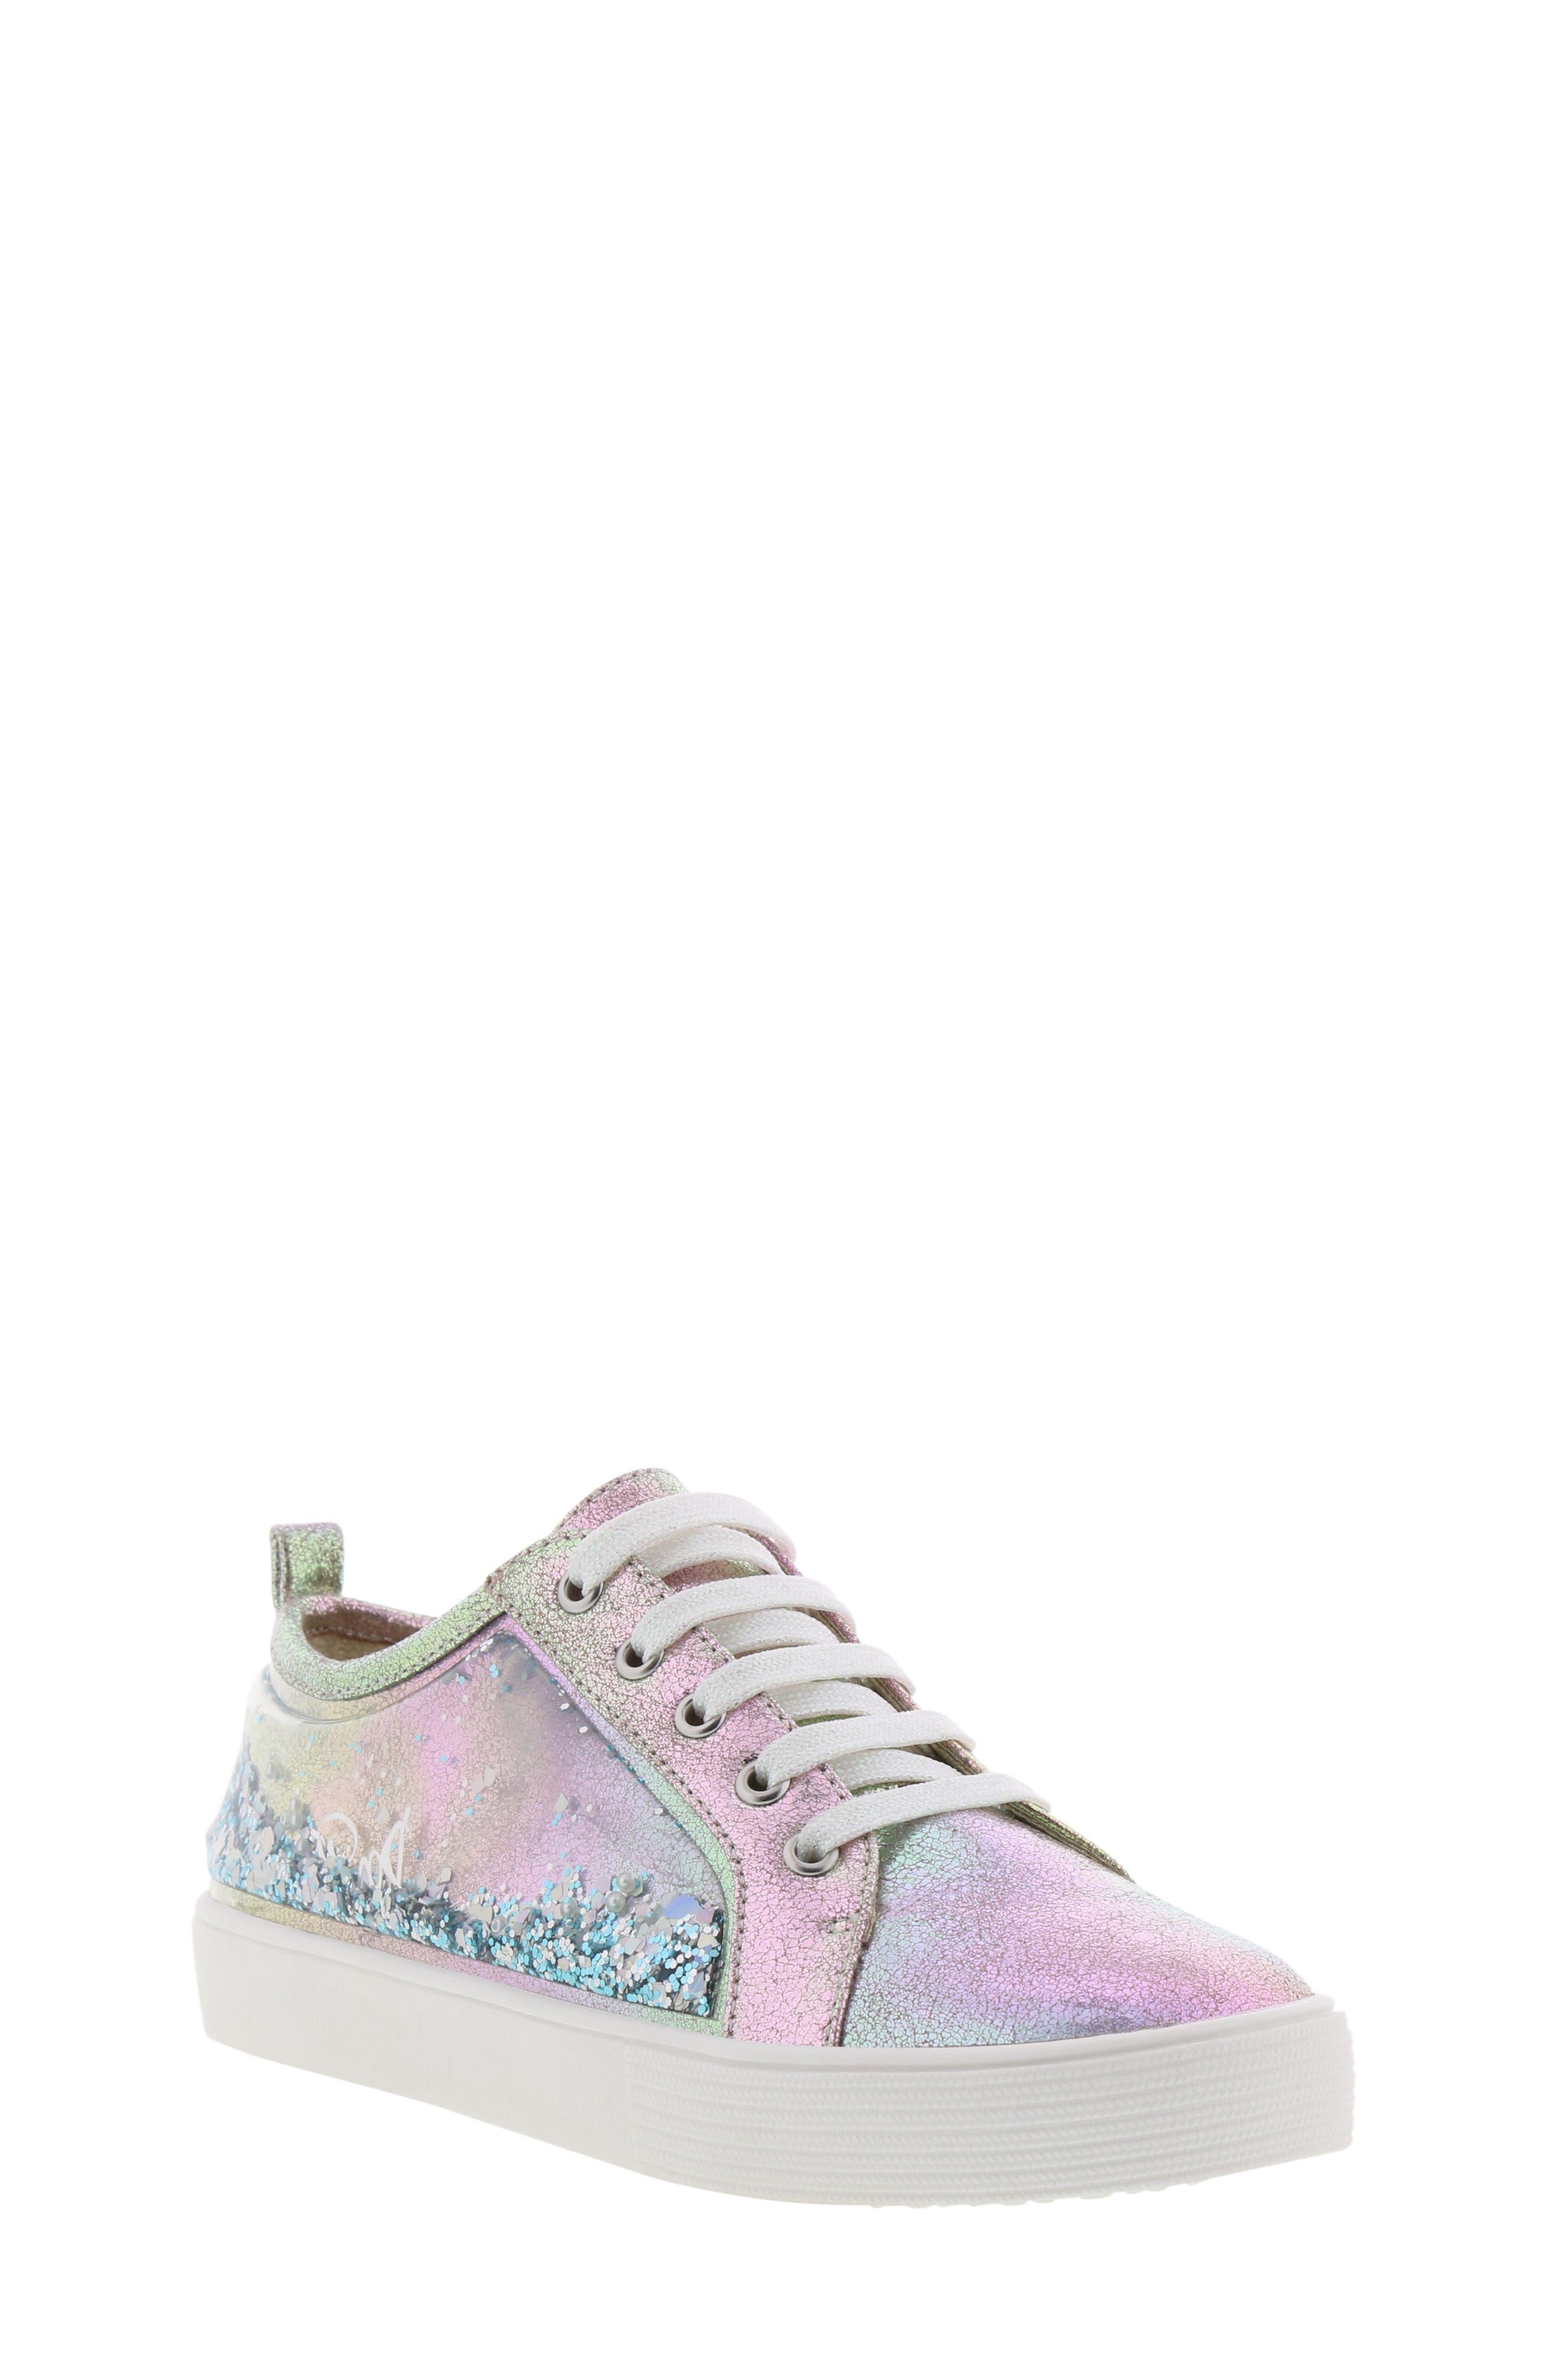 Bella Aqua Slip-On Sneaker, Main, color, GASOLINE IRIDESCENT